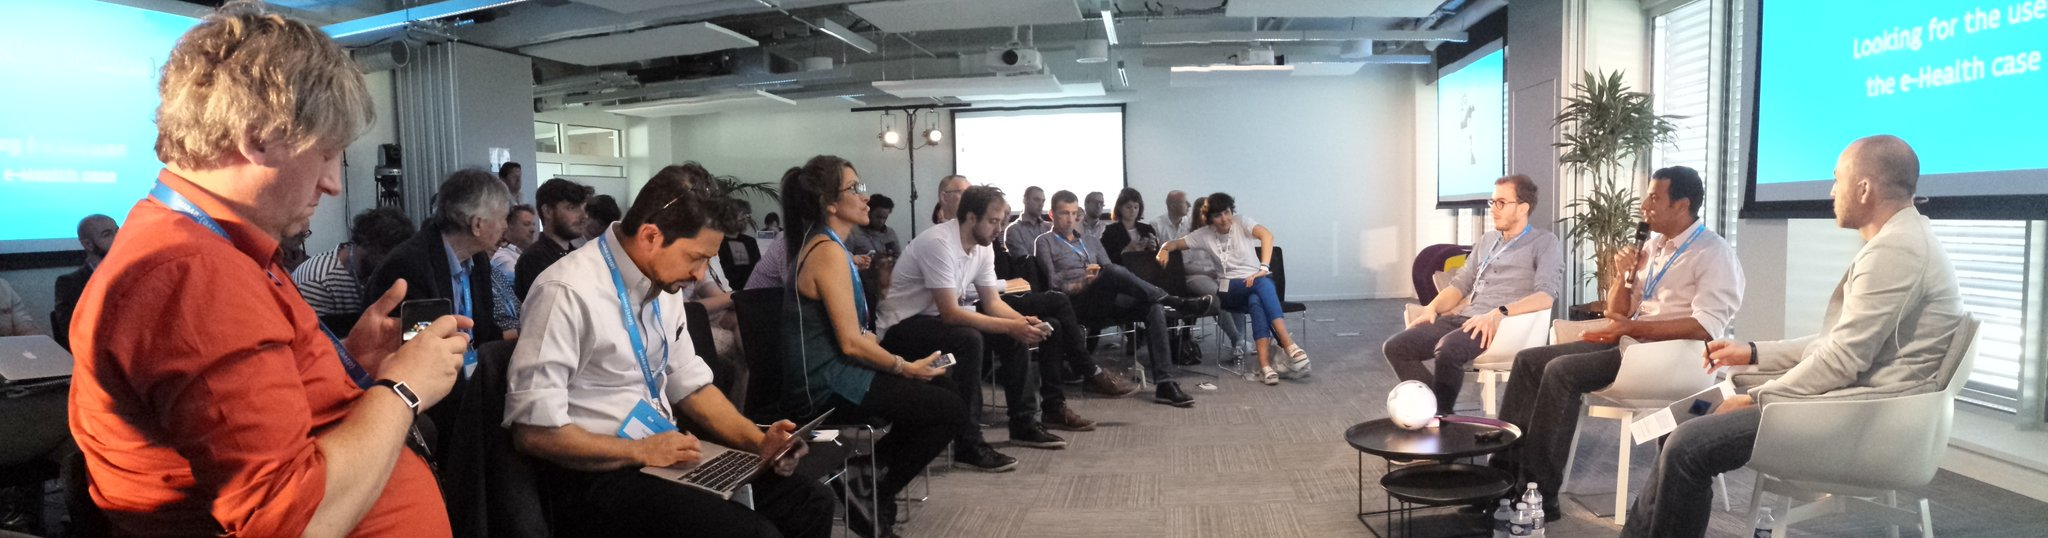 Great crowd & great talks at #dive2016 @Dive_Event #innovation #Rennes @IRT_BCom https://t.co/NyaZLHbgfq